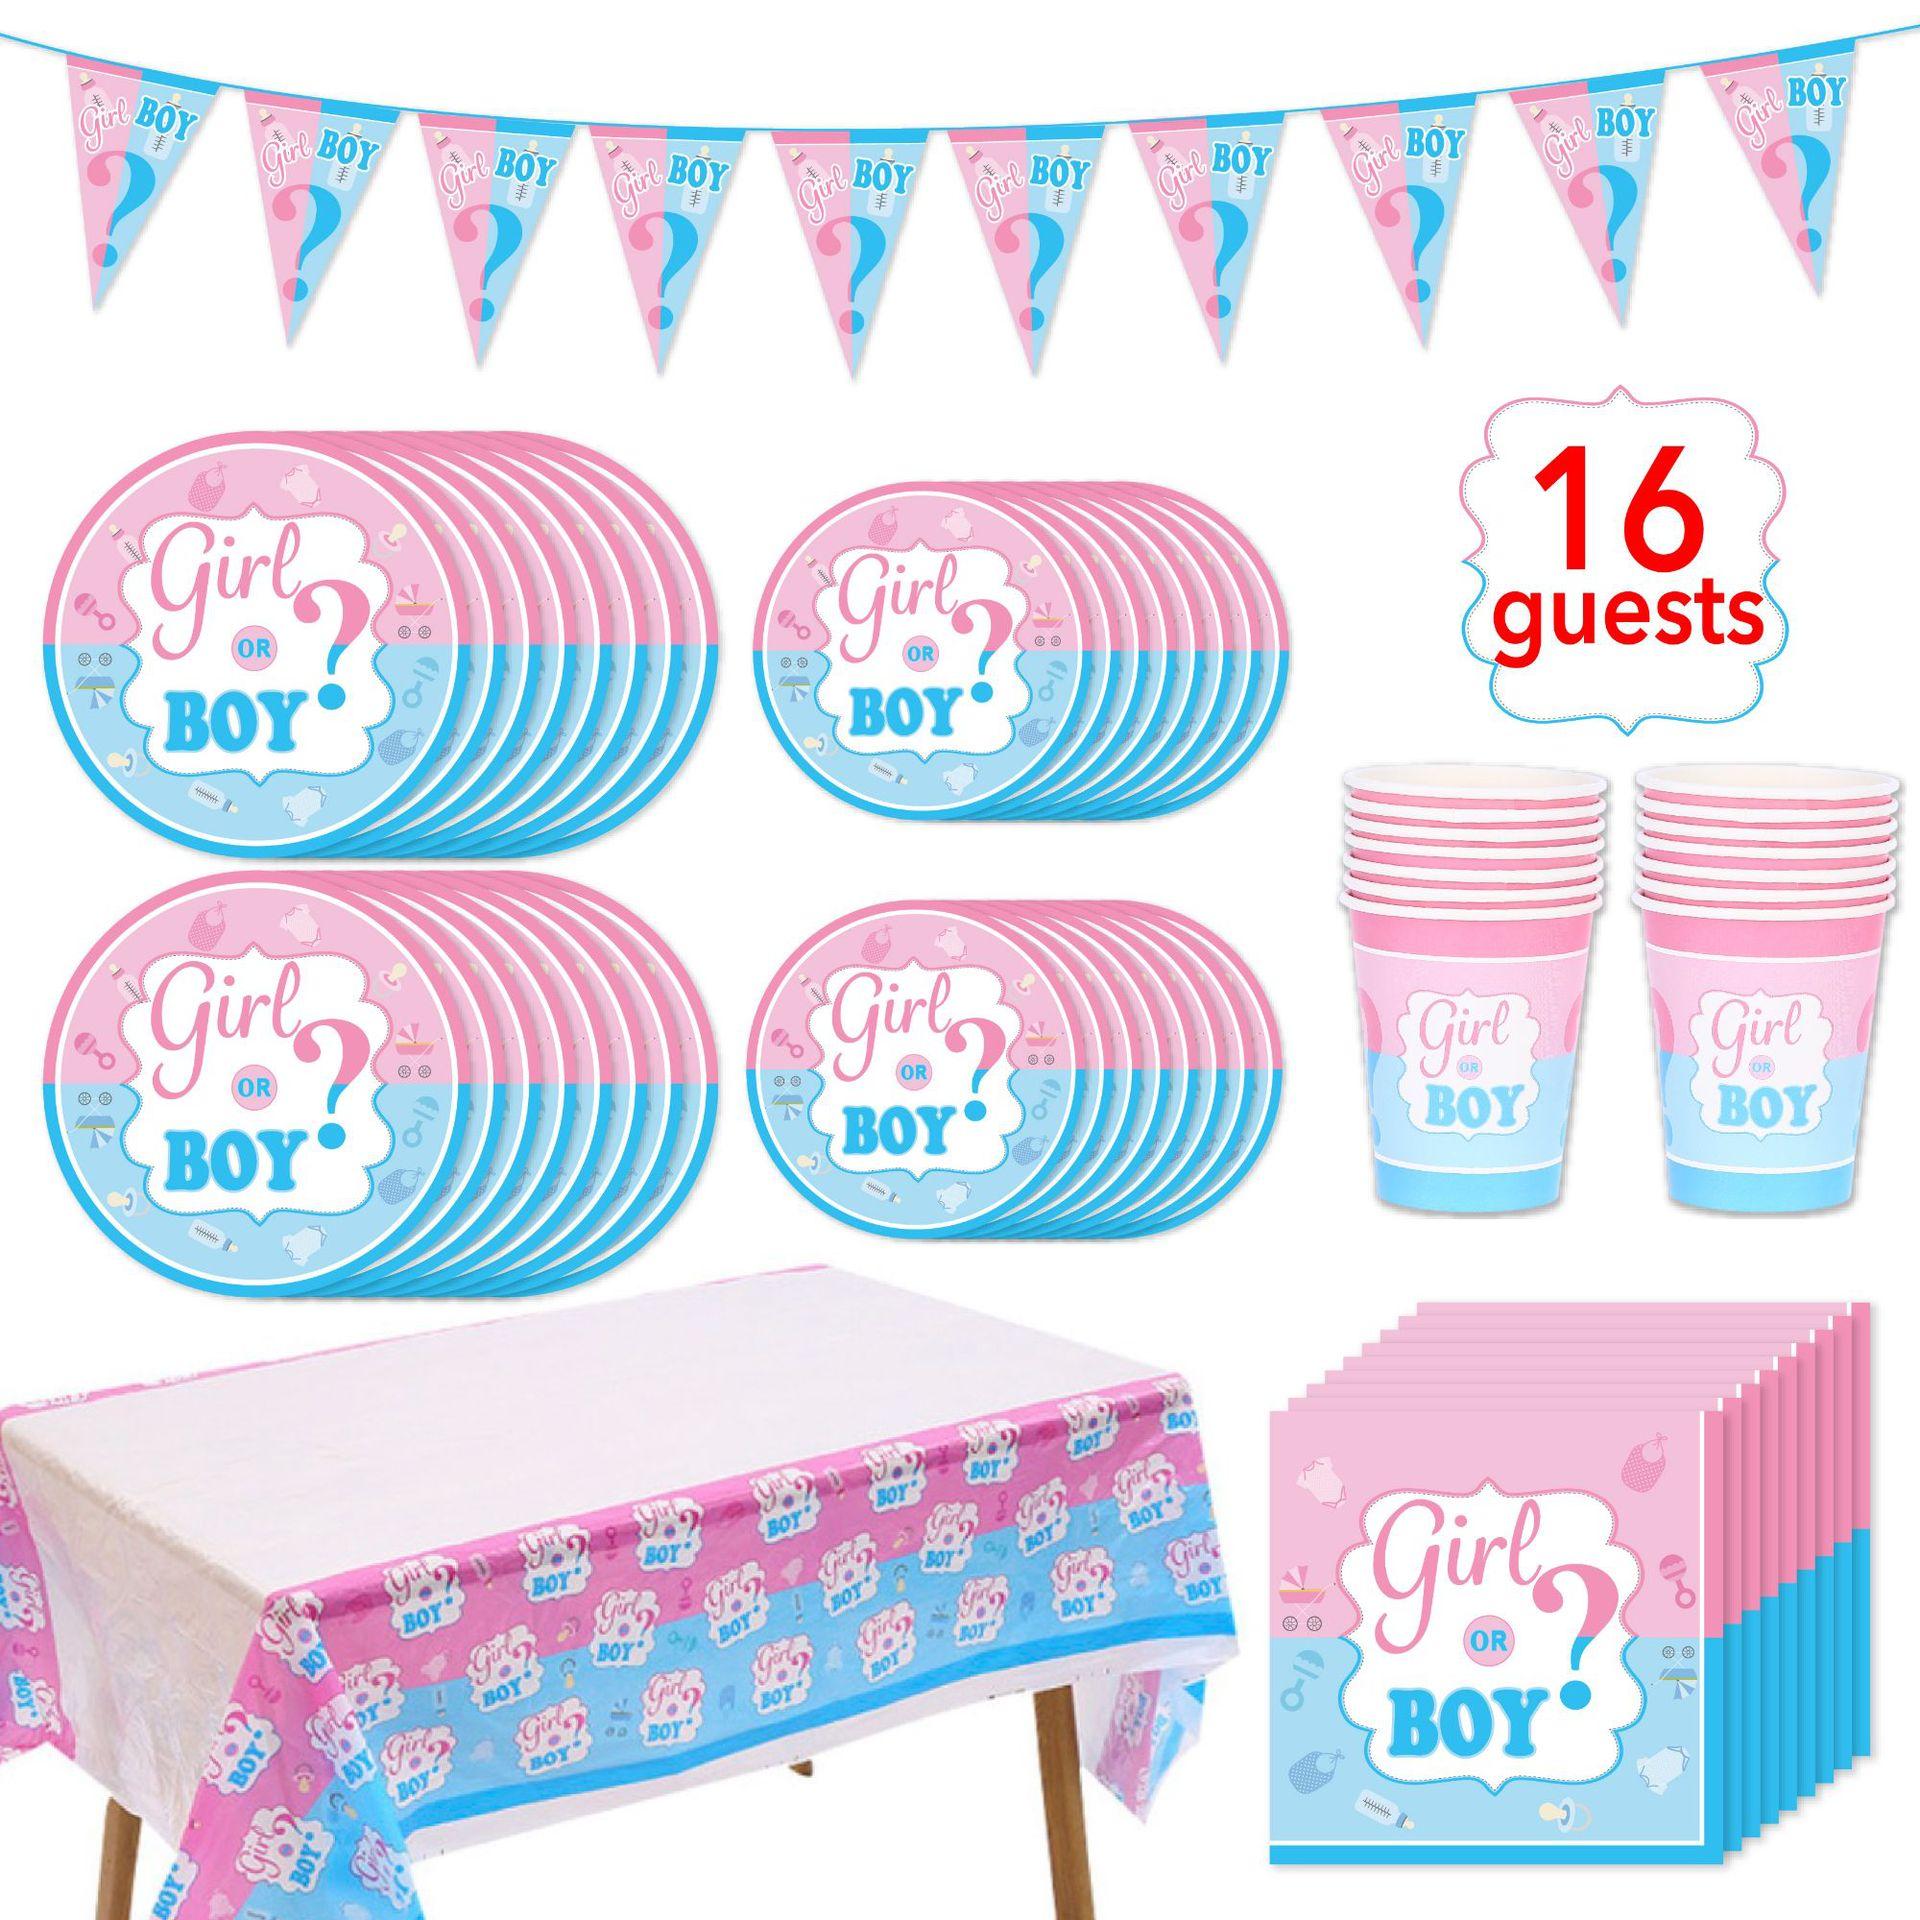 75pcs/set Gender Reveal Theme Paper Cup Plate Tableware Set Kids Girl Boy Favor Baby Shower Party Supplies Decoration